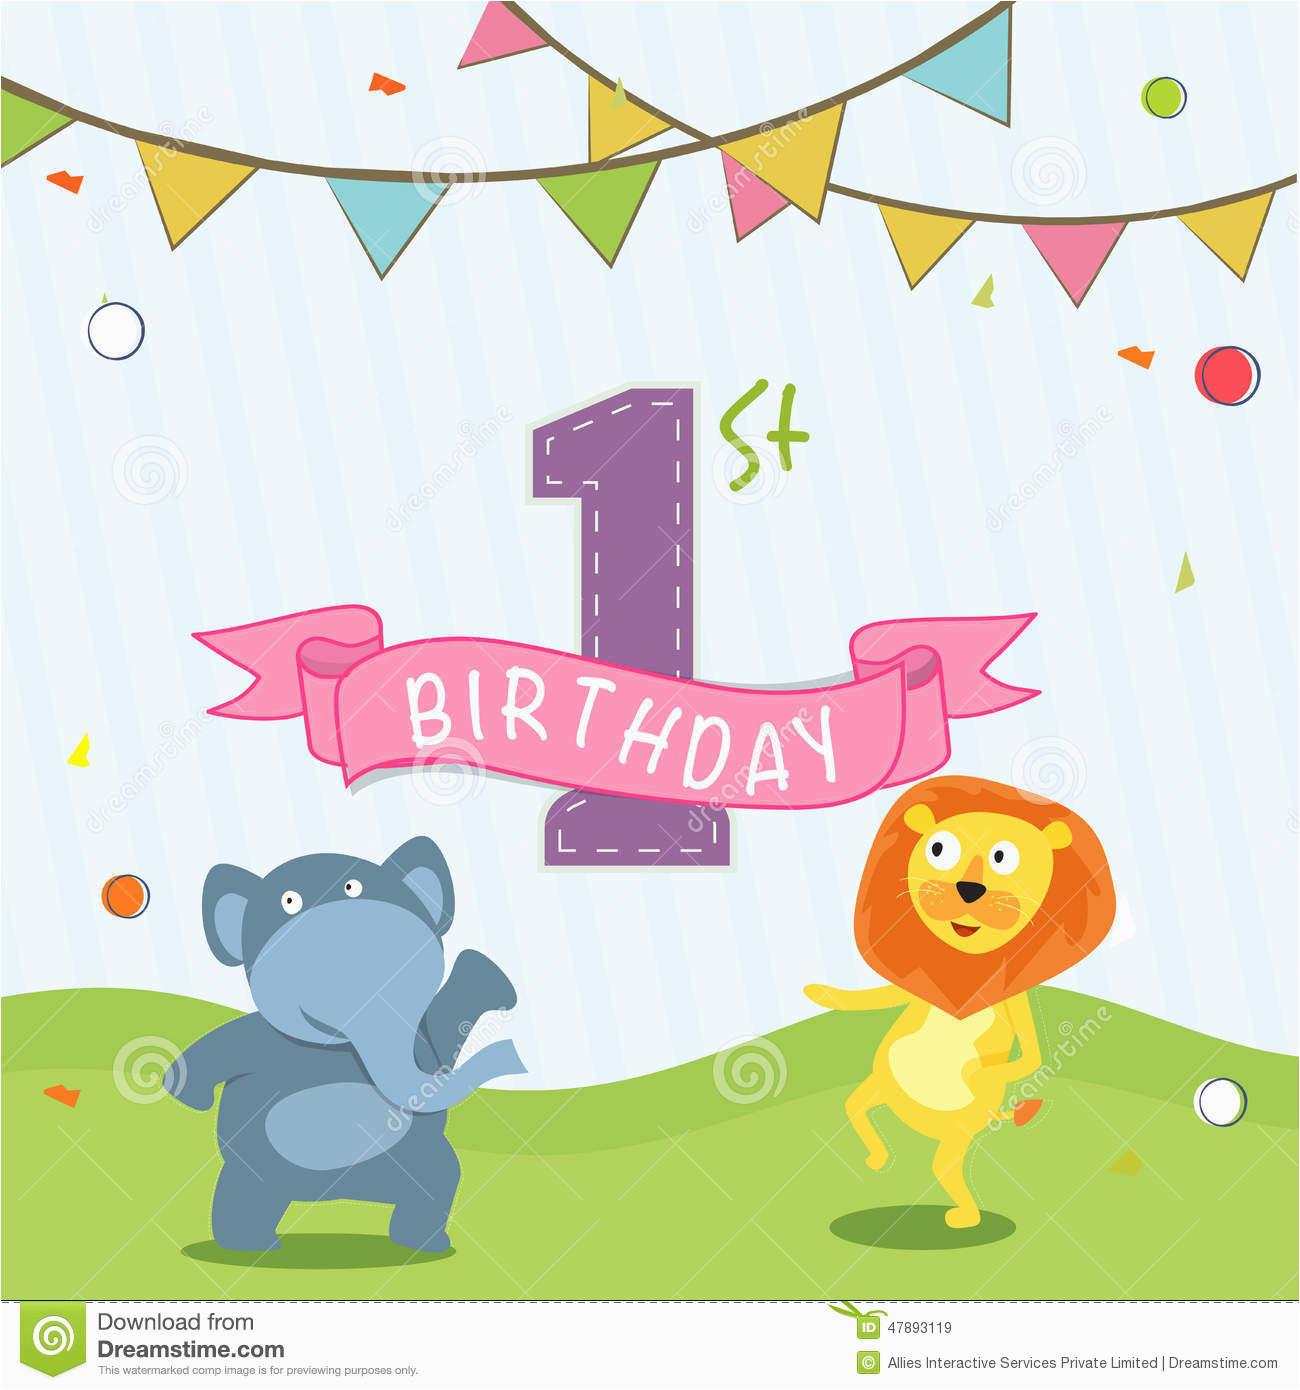 stock illustration kids st birthday celebration invitation card design party flag cartoon animals image47893119